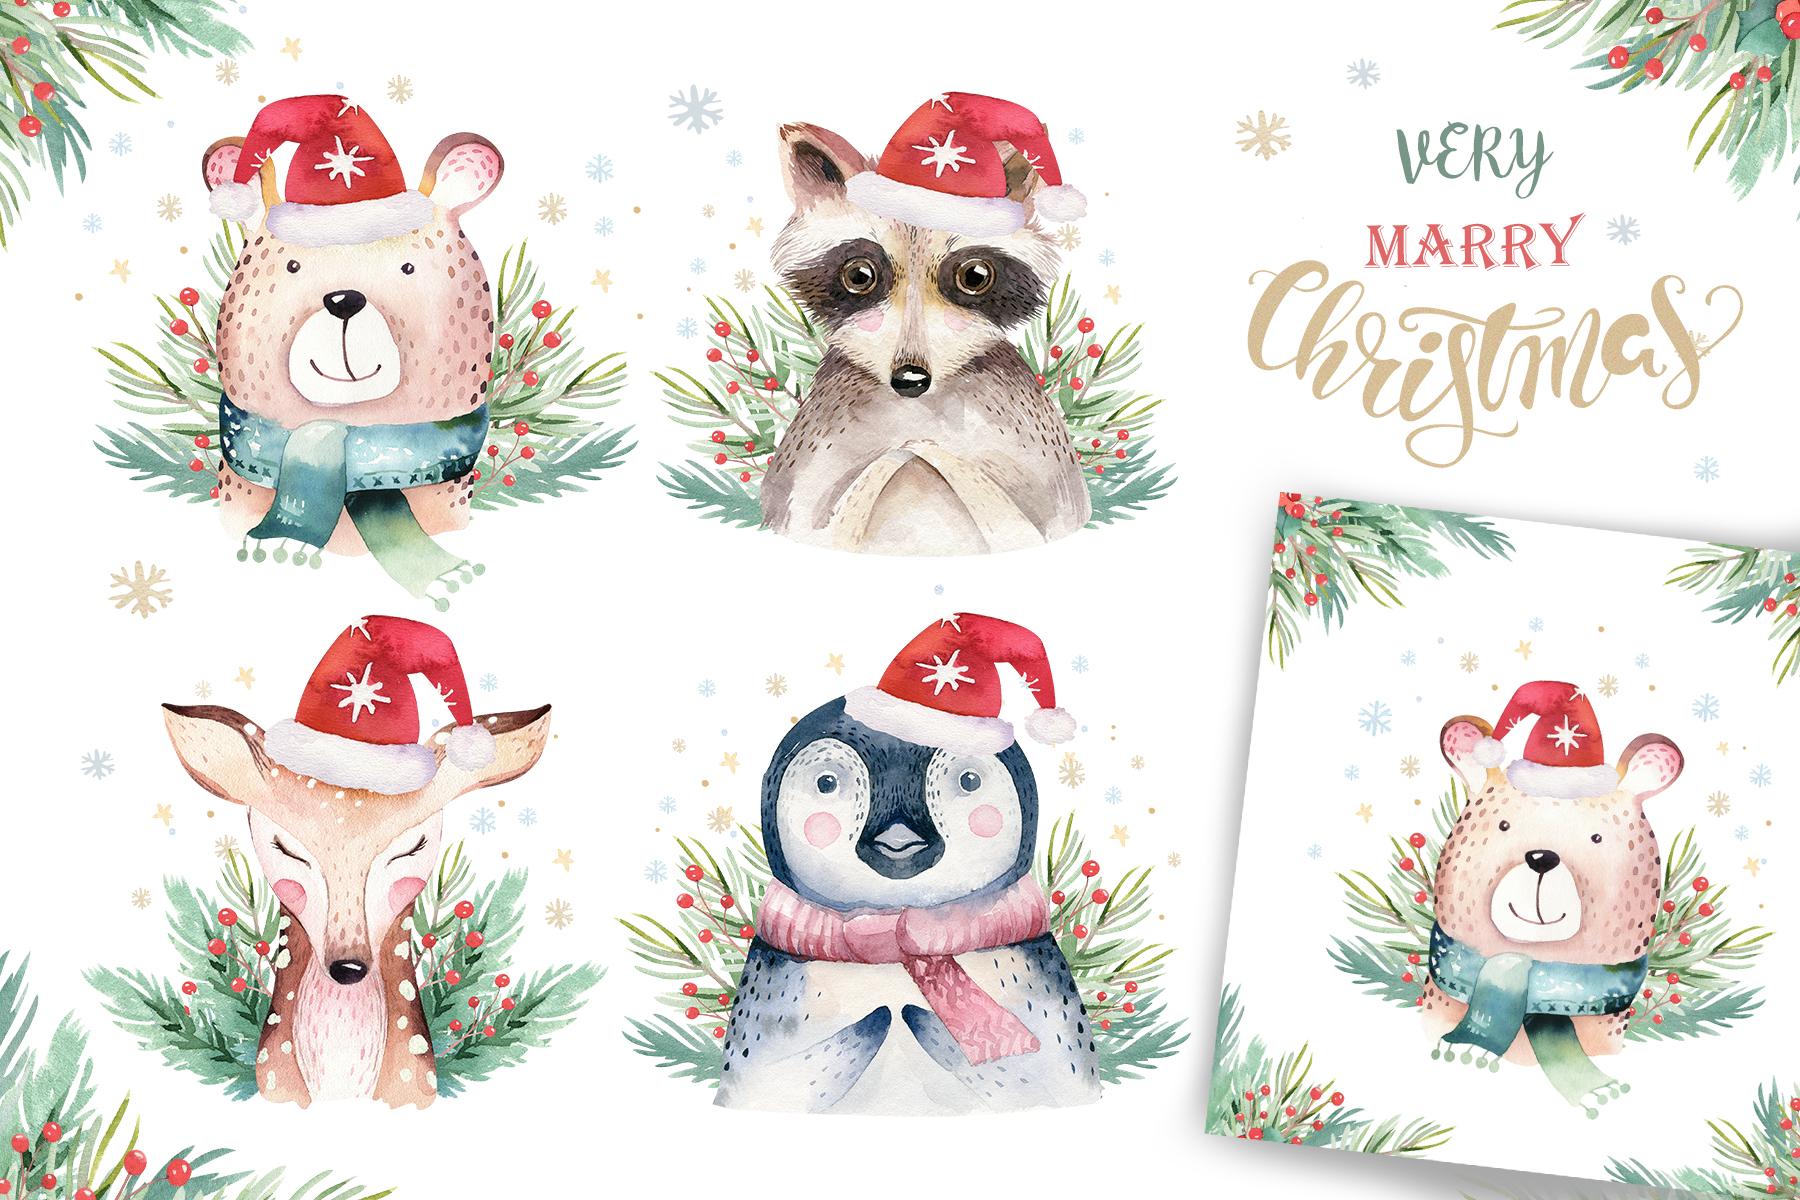 Watercolor Christmas animals raccoon, bear, deer and penguin example image 2